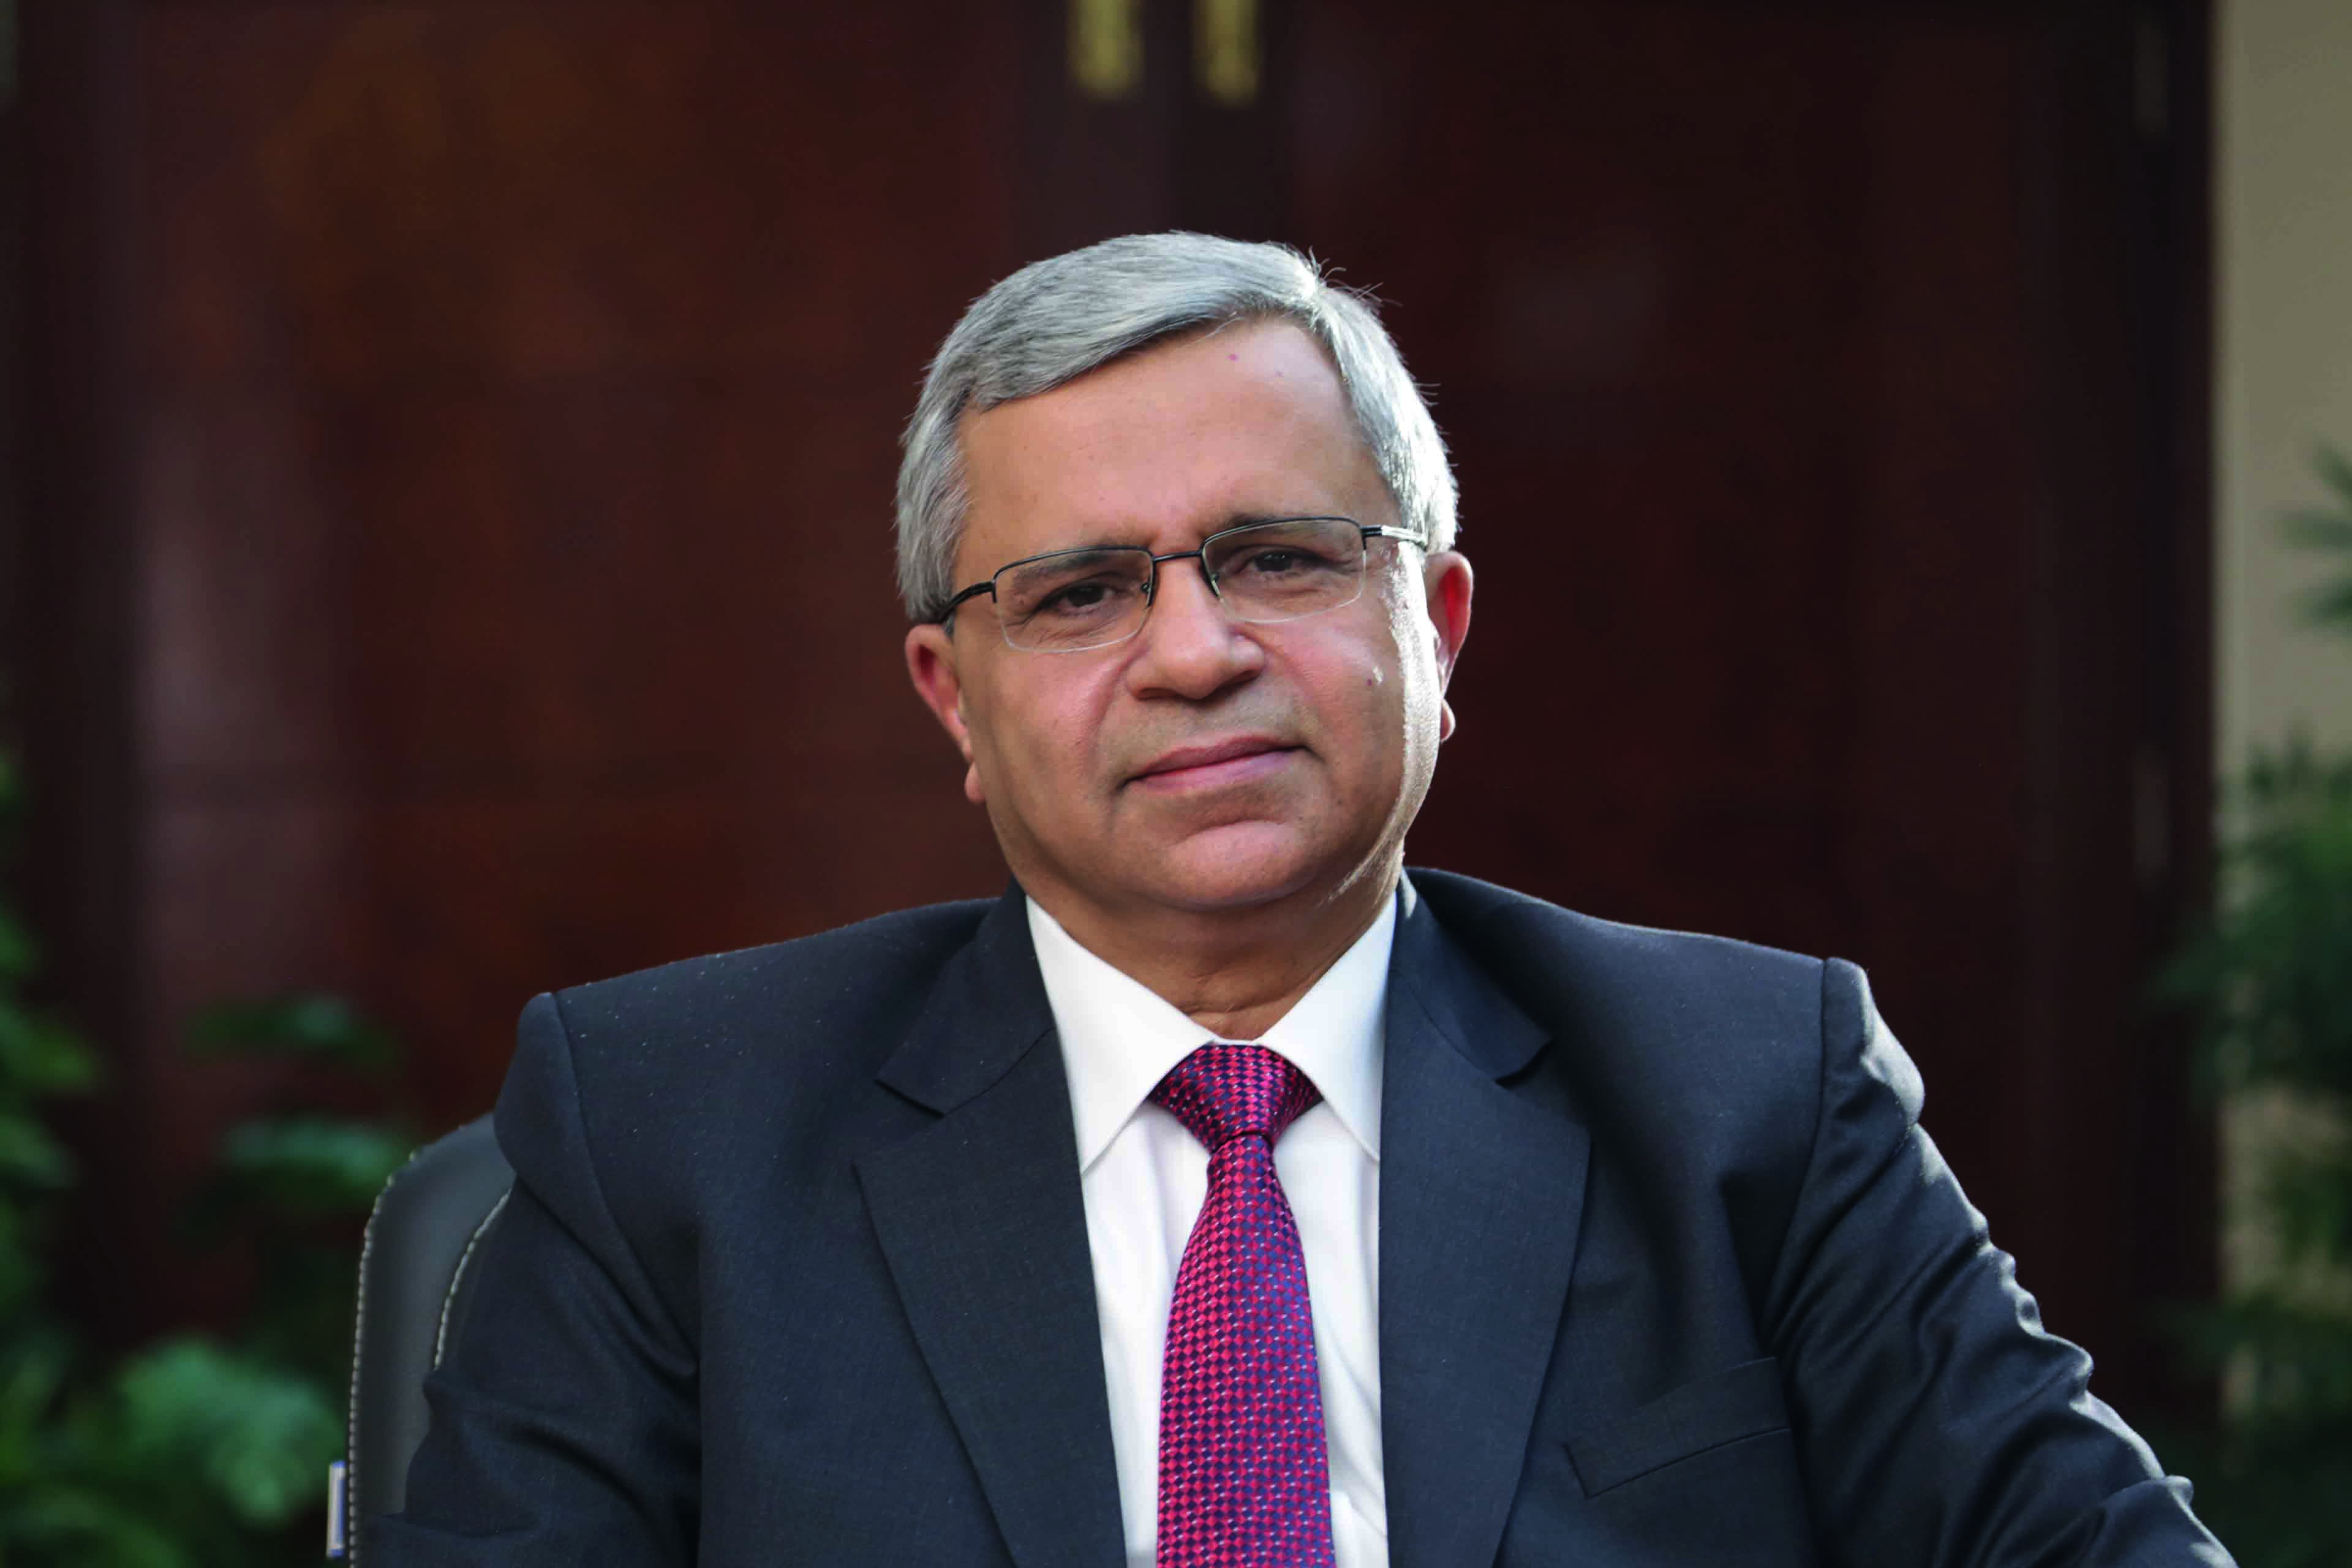 Rajeev Mehrotra